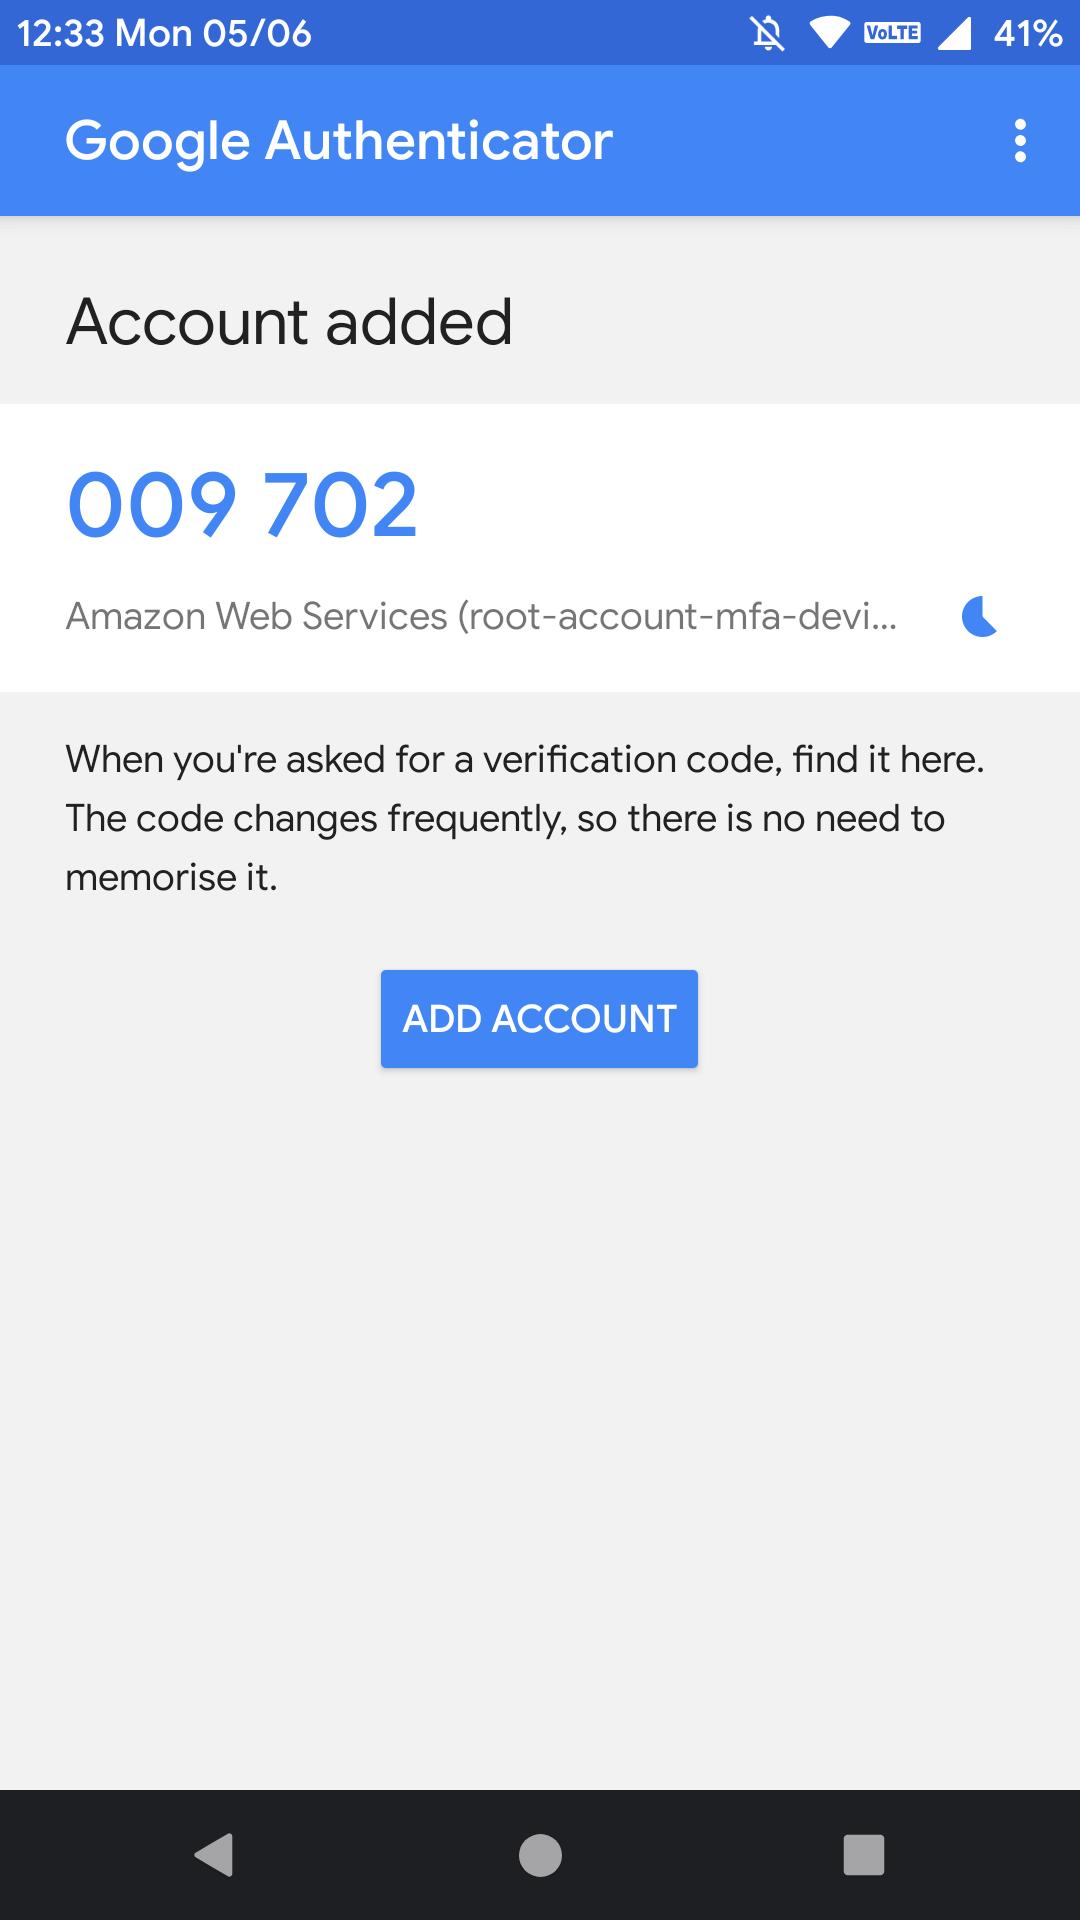 Google authenticator second code